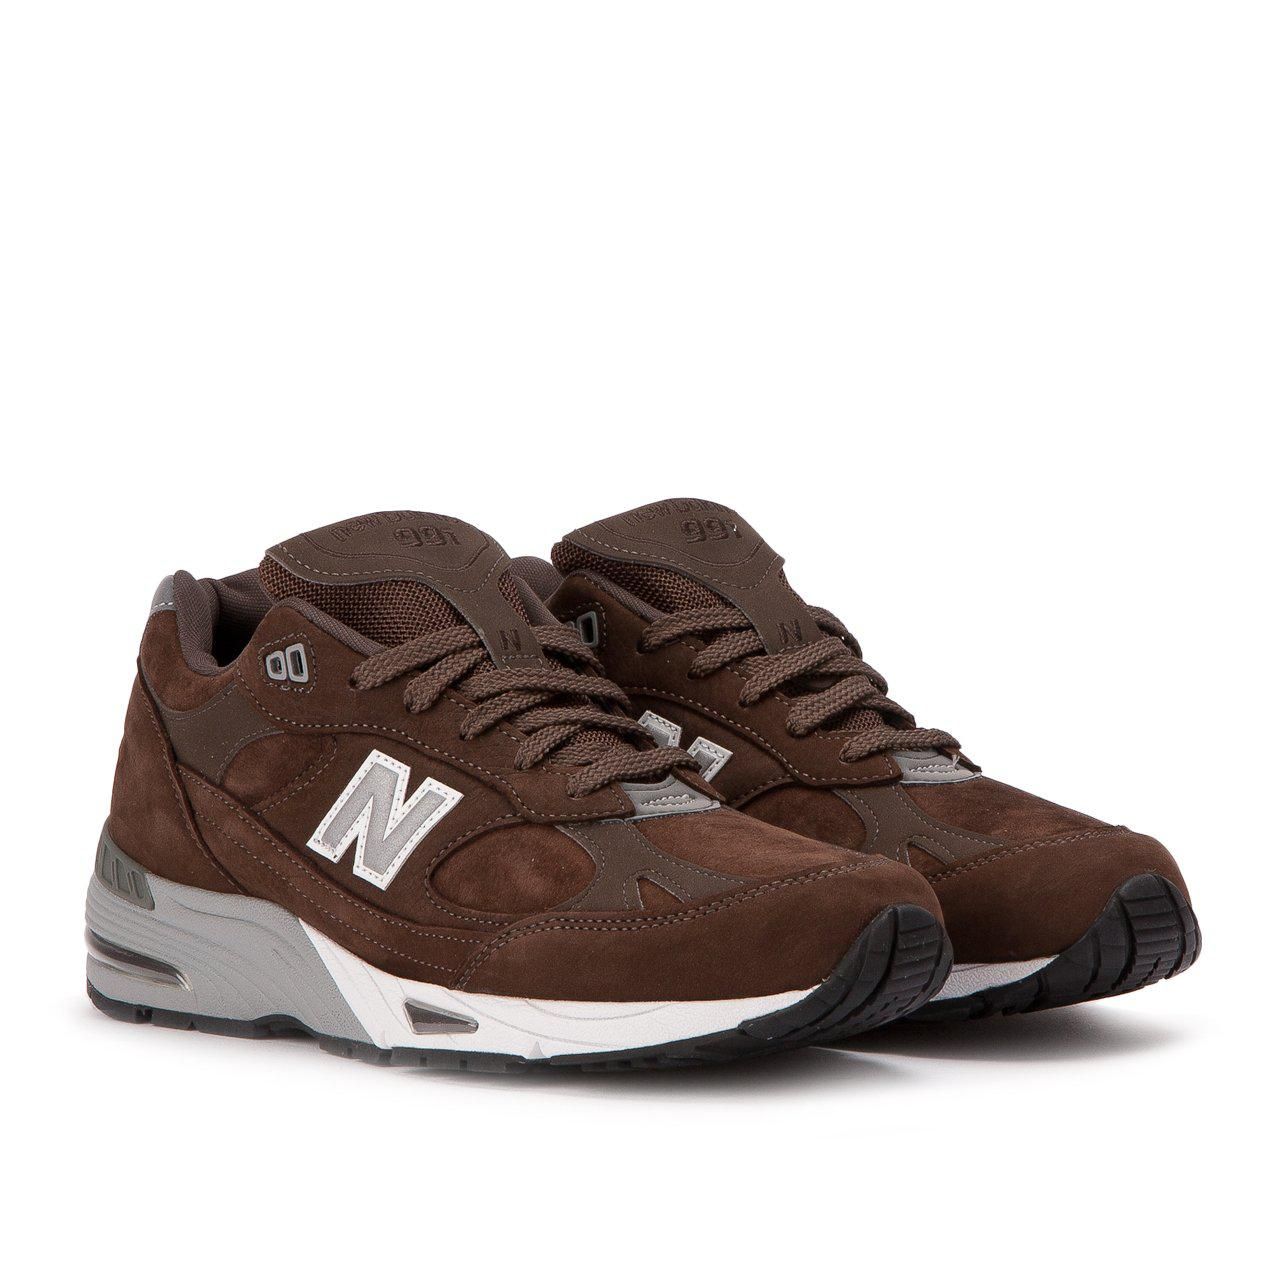 new balance 991 brown